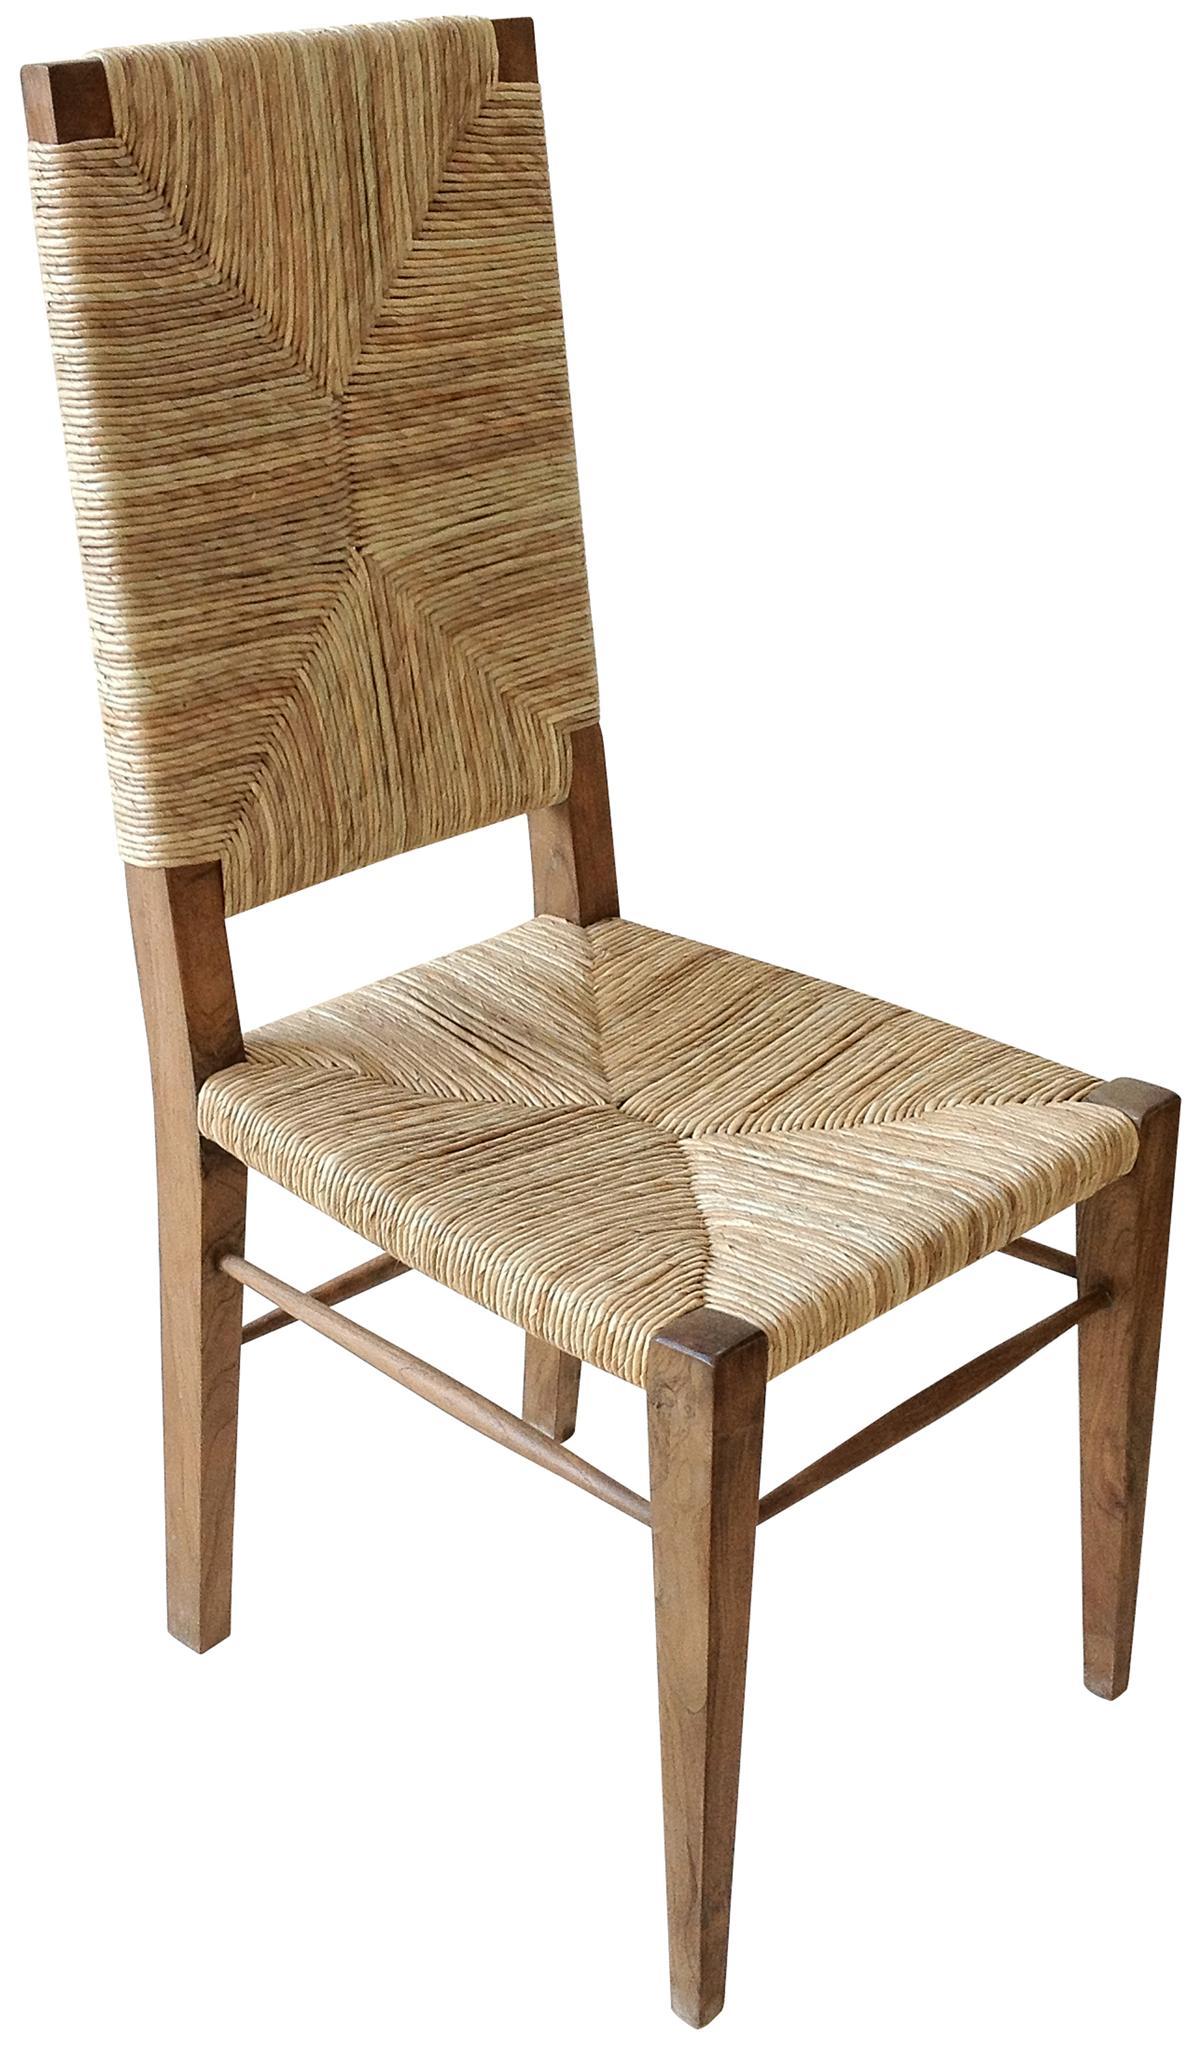 Etonnant Large Stewart Teak And Seagrass Dining Chair